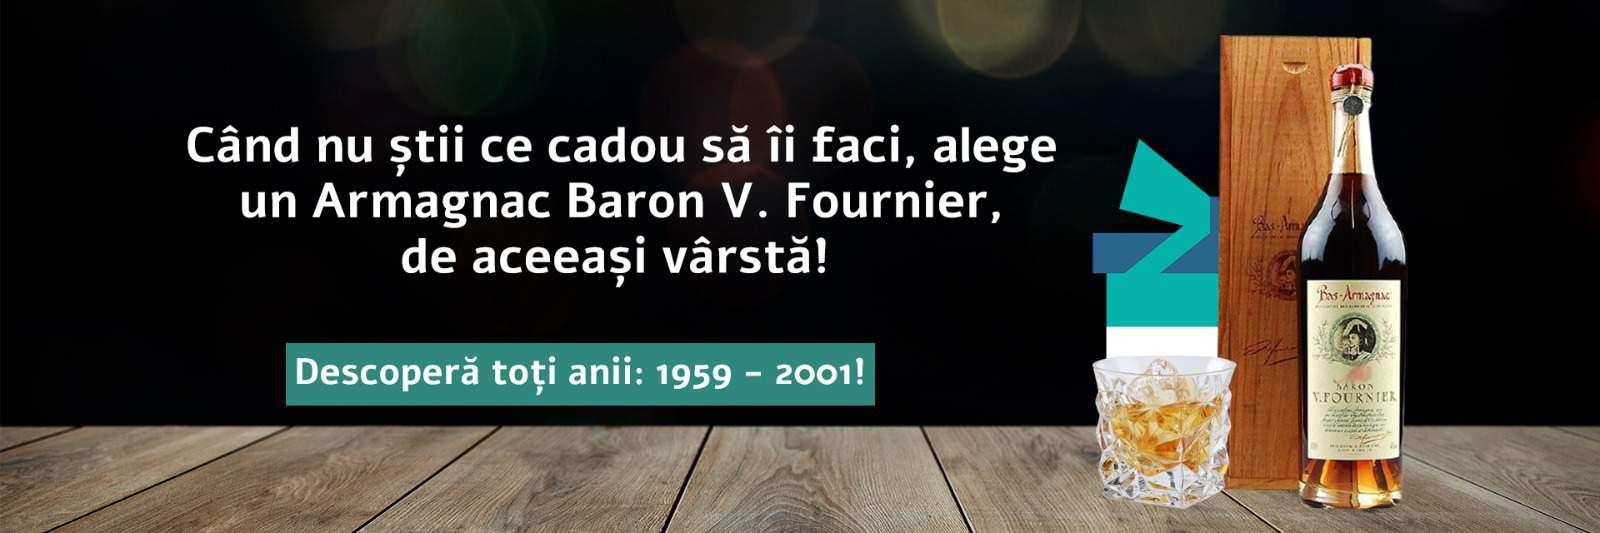 Armagnac Baron V. Fournier 1959-2001